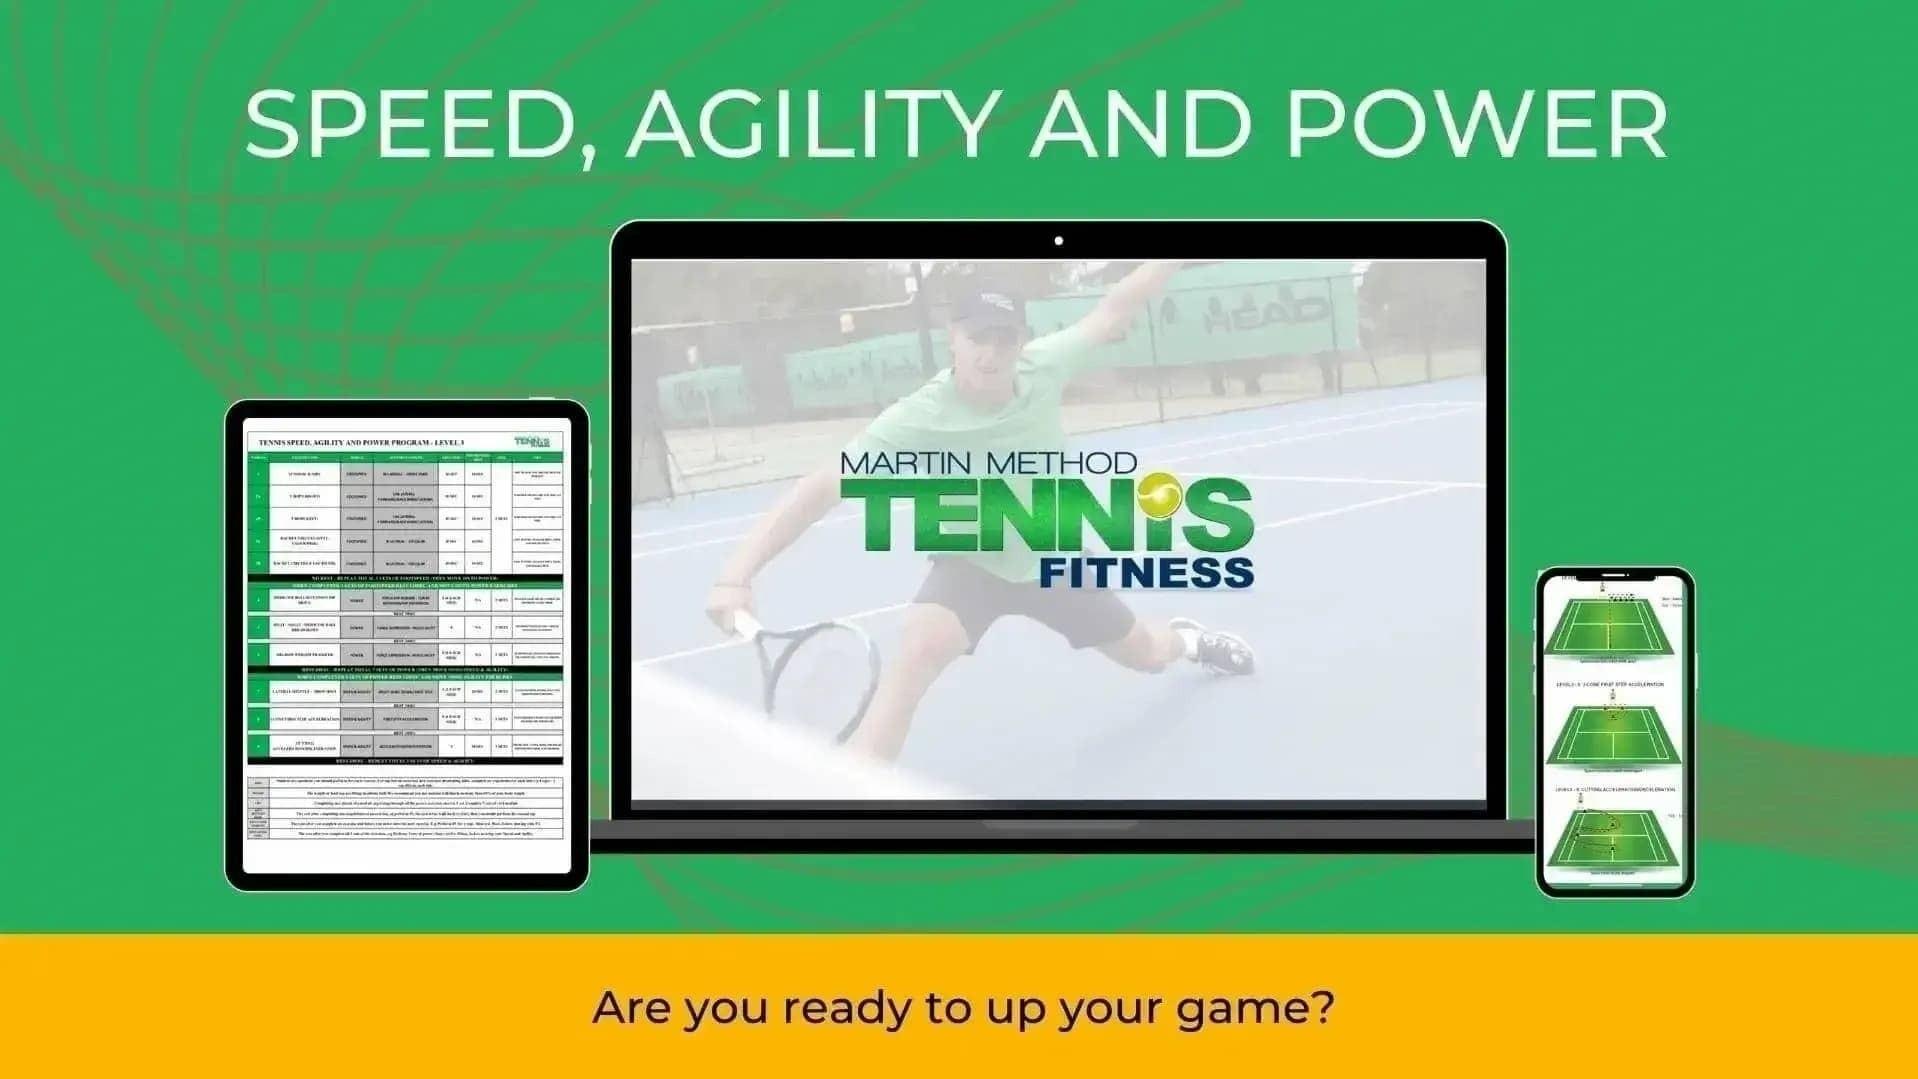 tennis-speed-agility-and-power-program